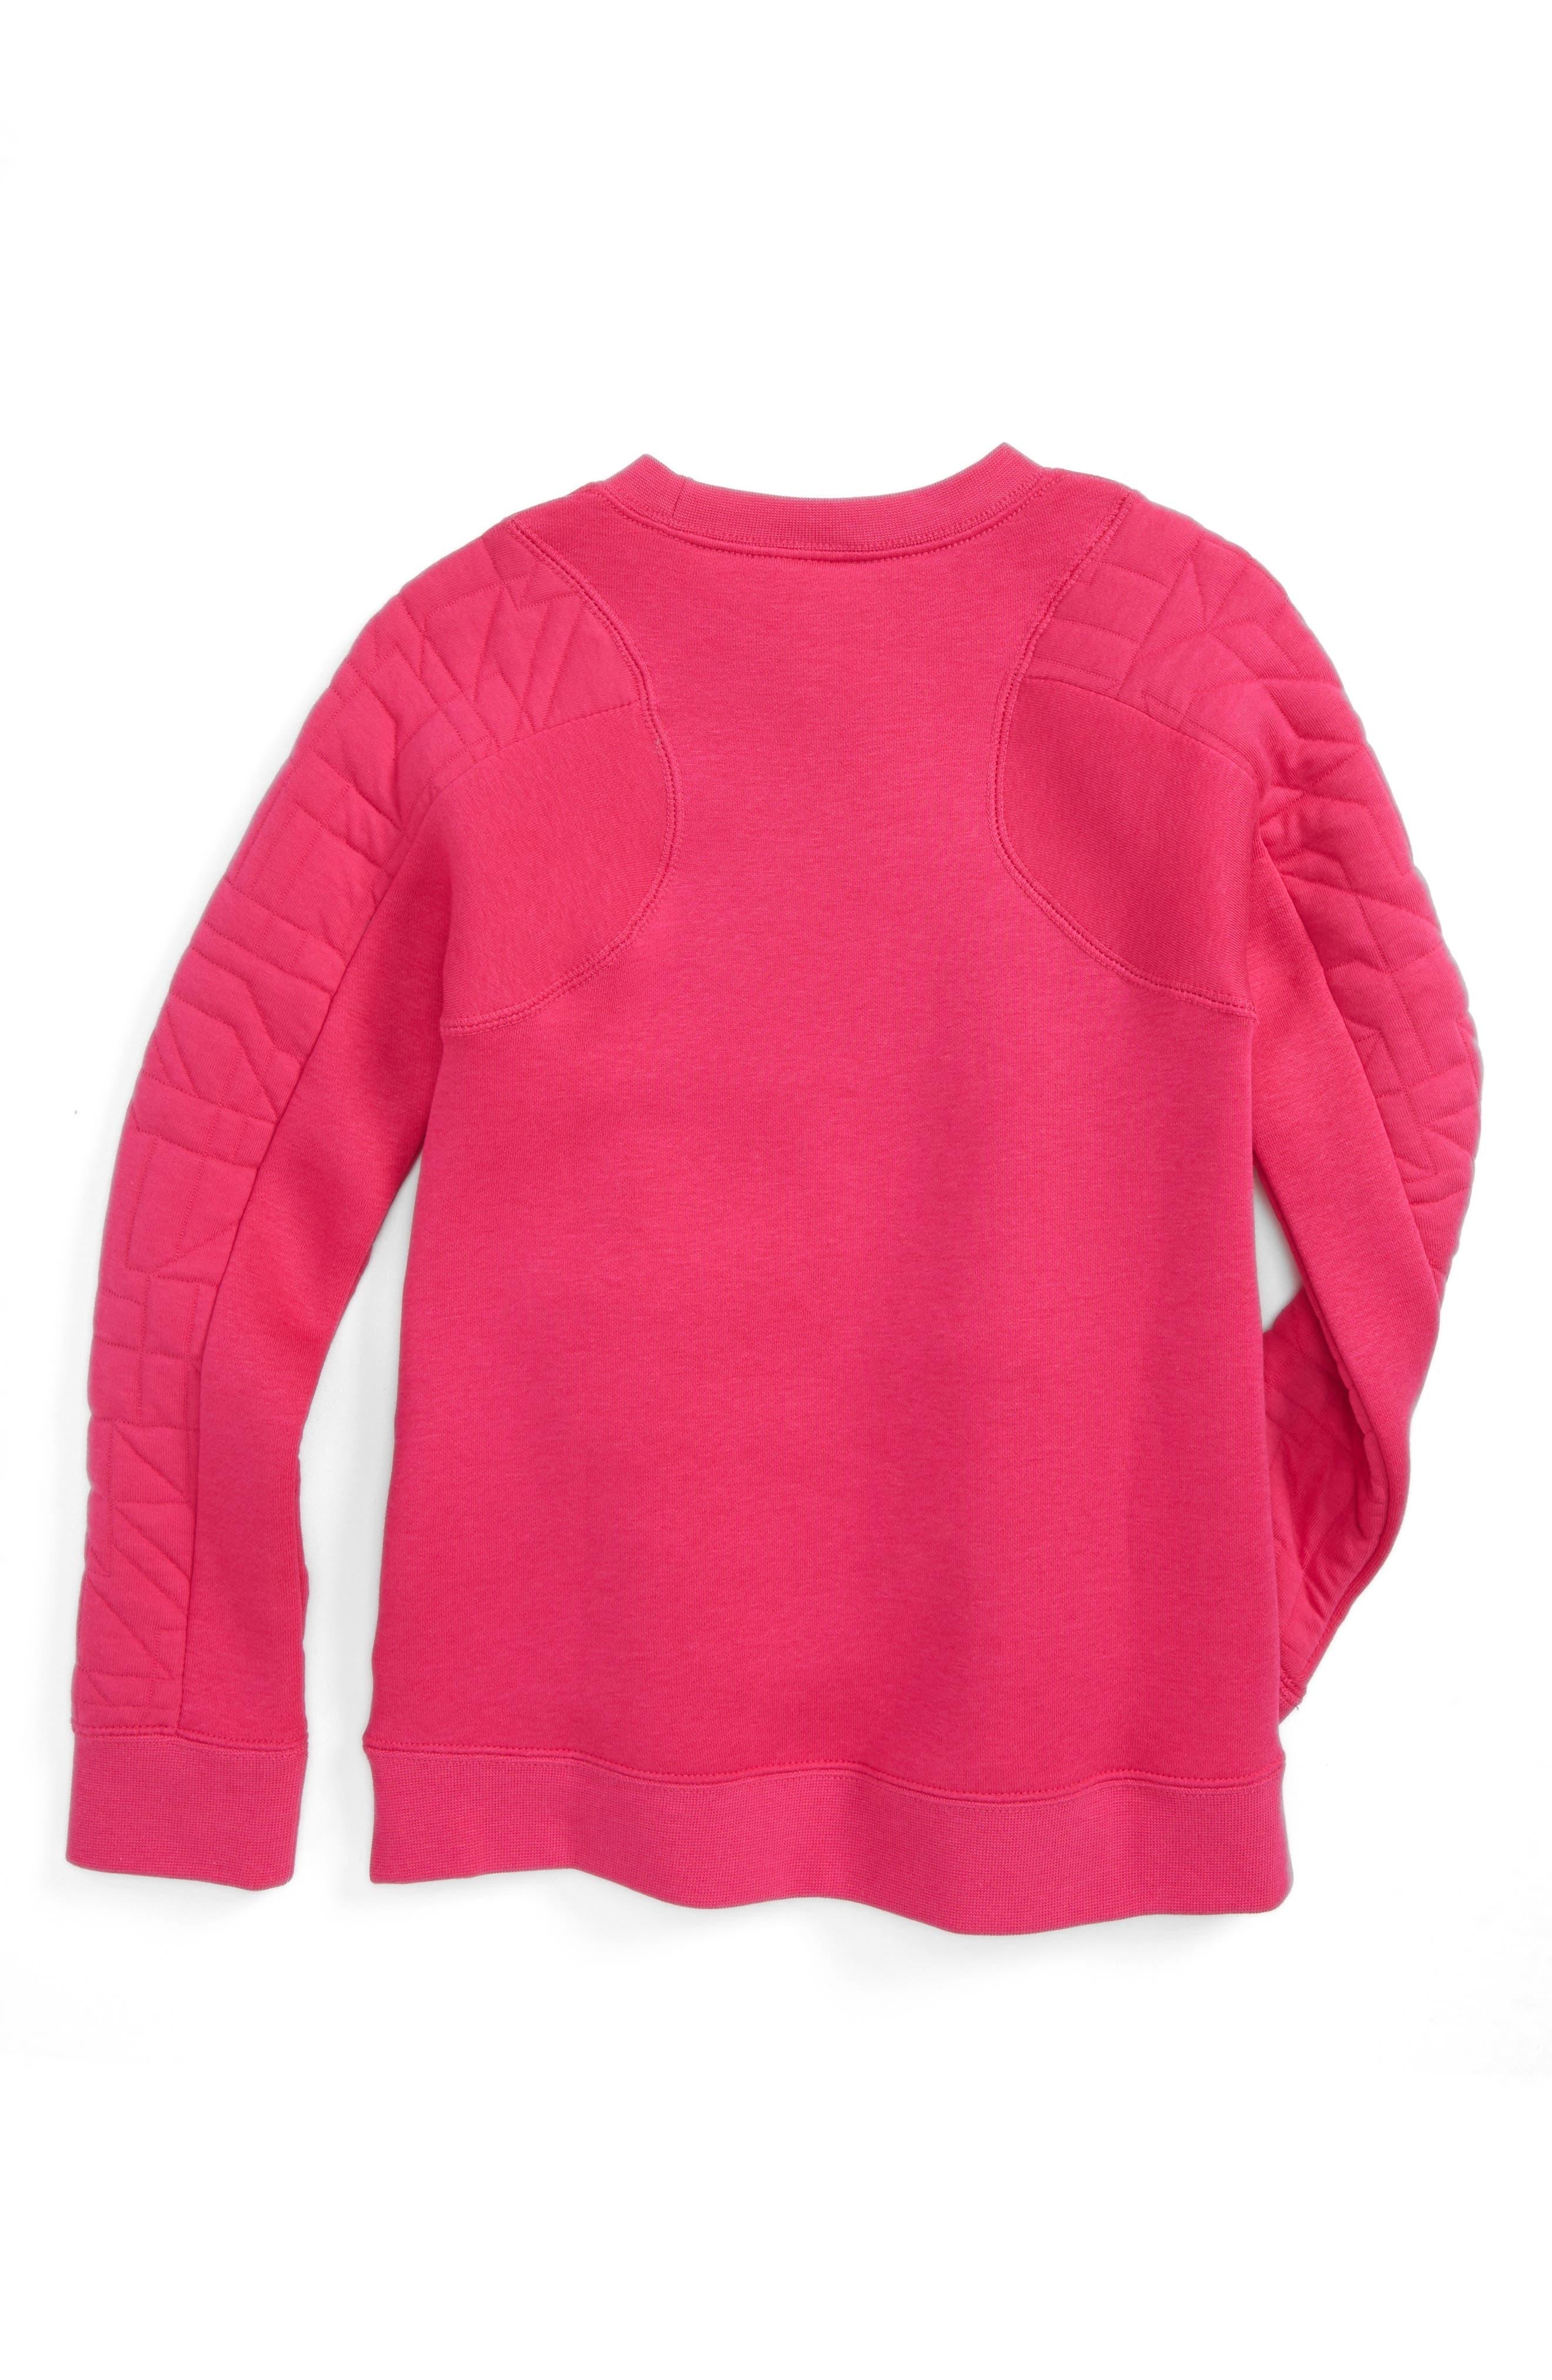 Alternate Image 2  - Nike Modern Matelassé Sweatshirt (Big Girls)